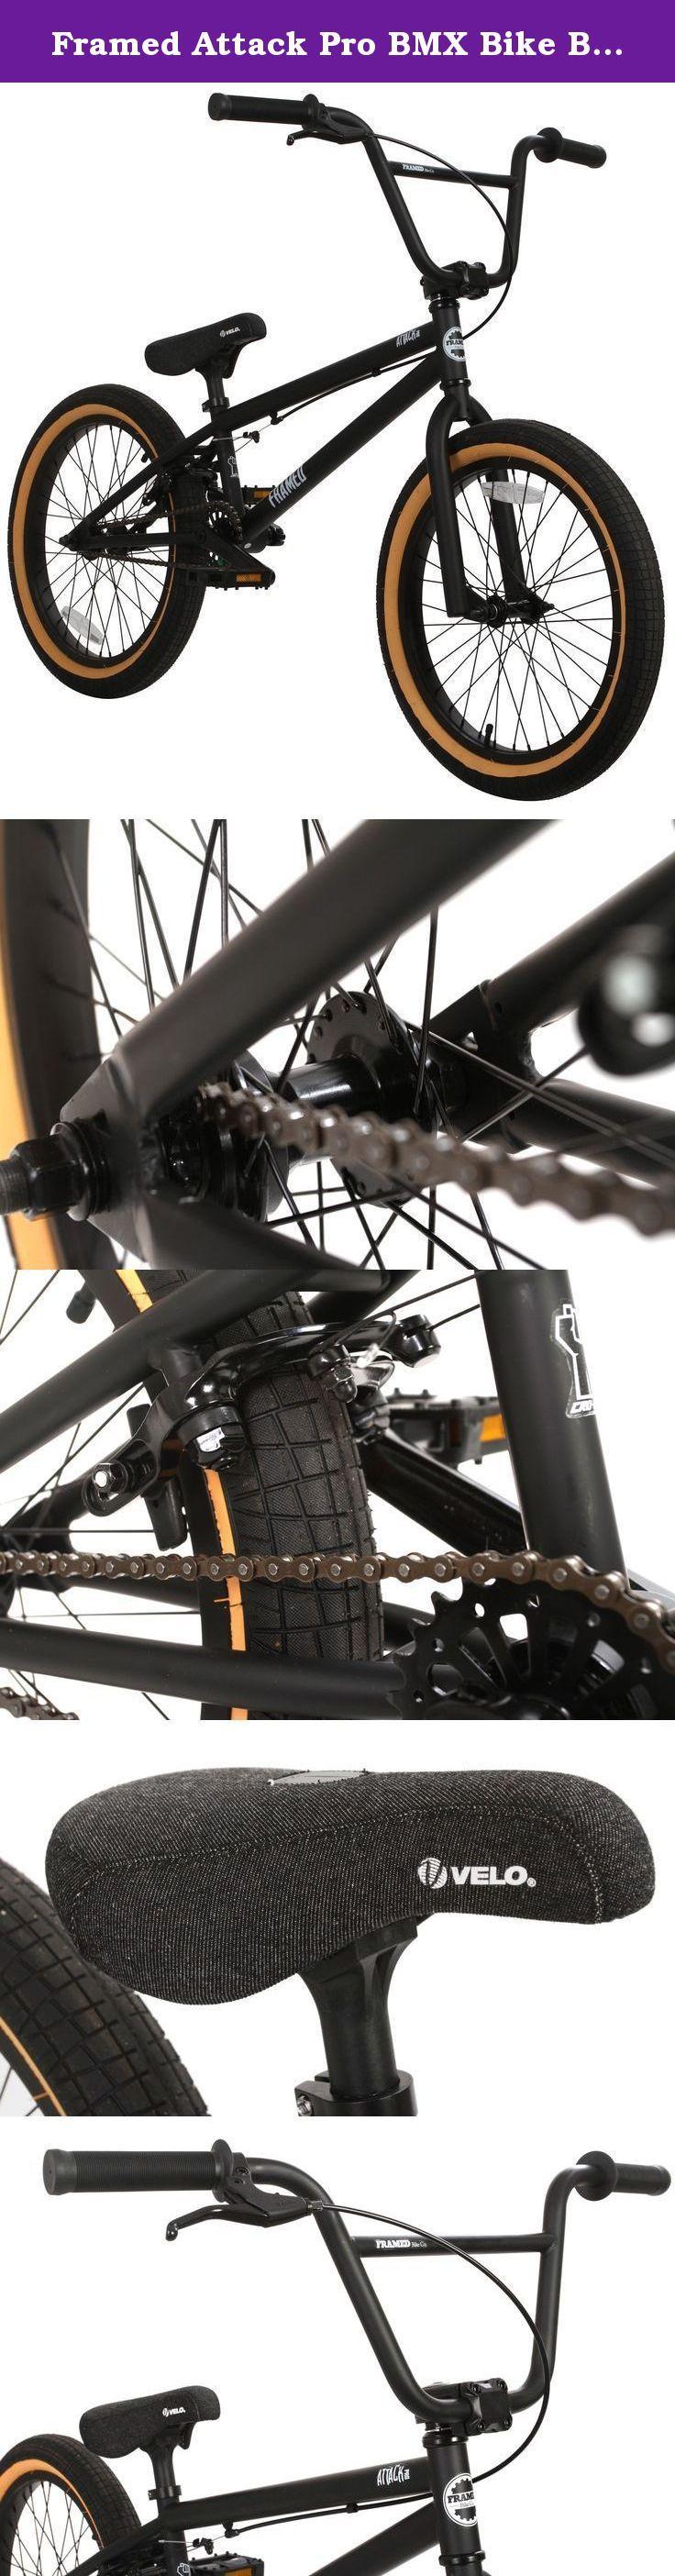 "Framed Attack Pro BMX Bike Black/Black Sz 20in. Key Features of the Framed Attack Pro BMX Bike: Frame - Chromoly Triangle. Forks - 1-1/8Th Chromoly Legs. Bars - Framed 2Pc Chromoly Bars (8 3/4"" Tall X 29"" Wide). Grips - Velo Mean Mug 147mm. Stem - Framed Alloy Front Load. Headset - Neco 28.6 6/34/30mm. Brake Lever - Apse Alloy Lever W/Adjuster. Brake - Apse Alloy U-Brake. Cranks - 3Pc Chromoly Tubular 175mm W/Unsealed American Bottom Bracket. Sprocket - 25T Steel. Chain - Kmc Z410 Half…"